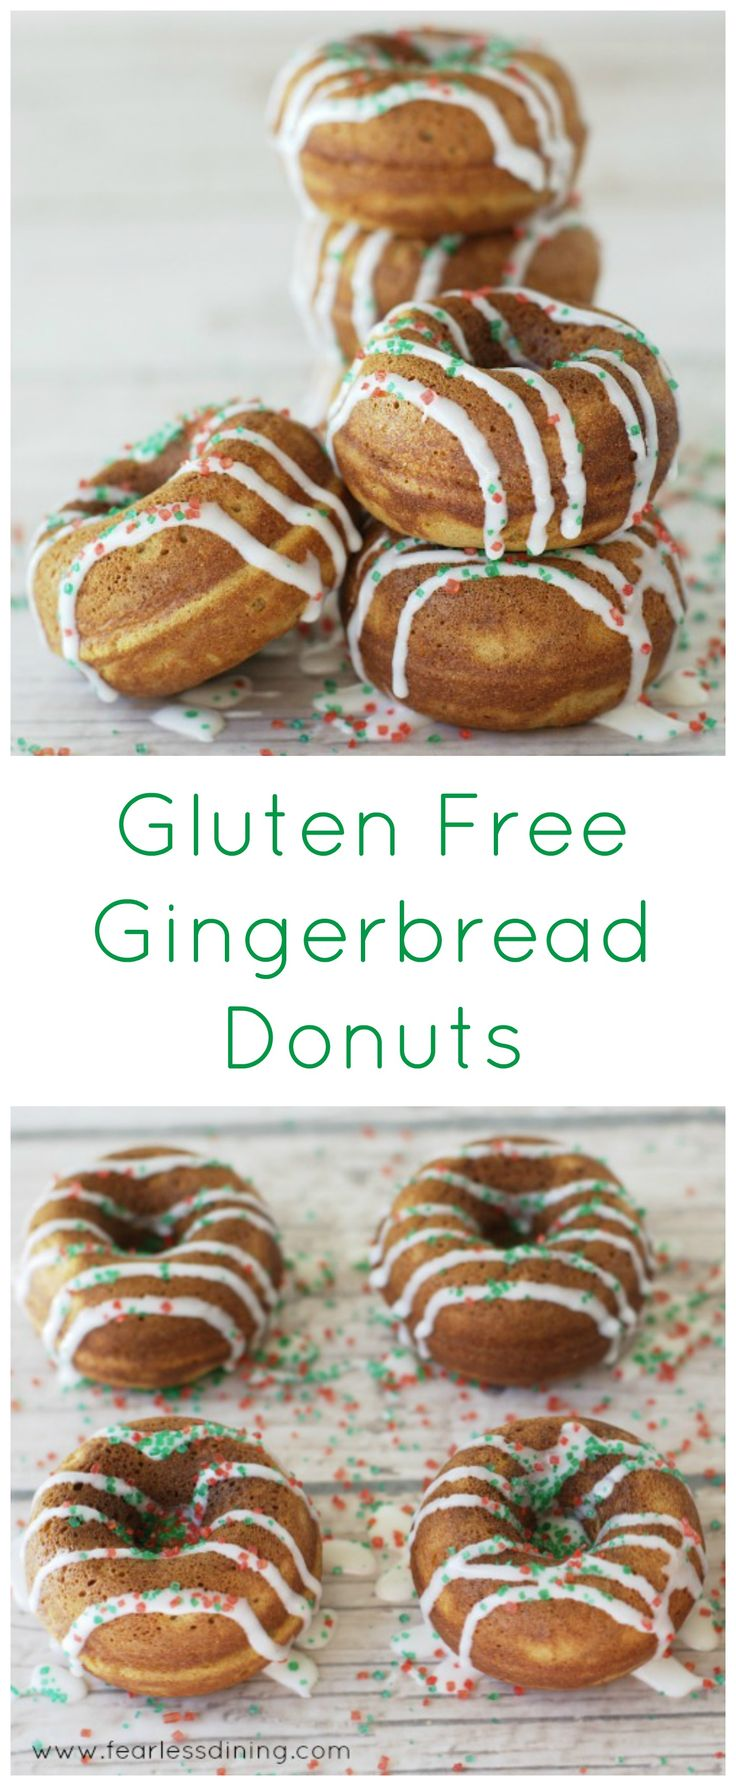 gluten free gingerbread donuts muffin sans gluten gluten free donuts ...